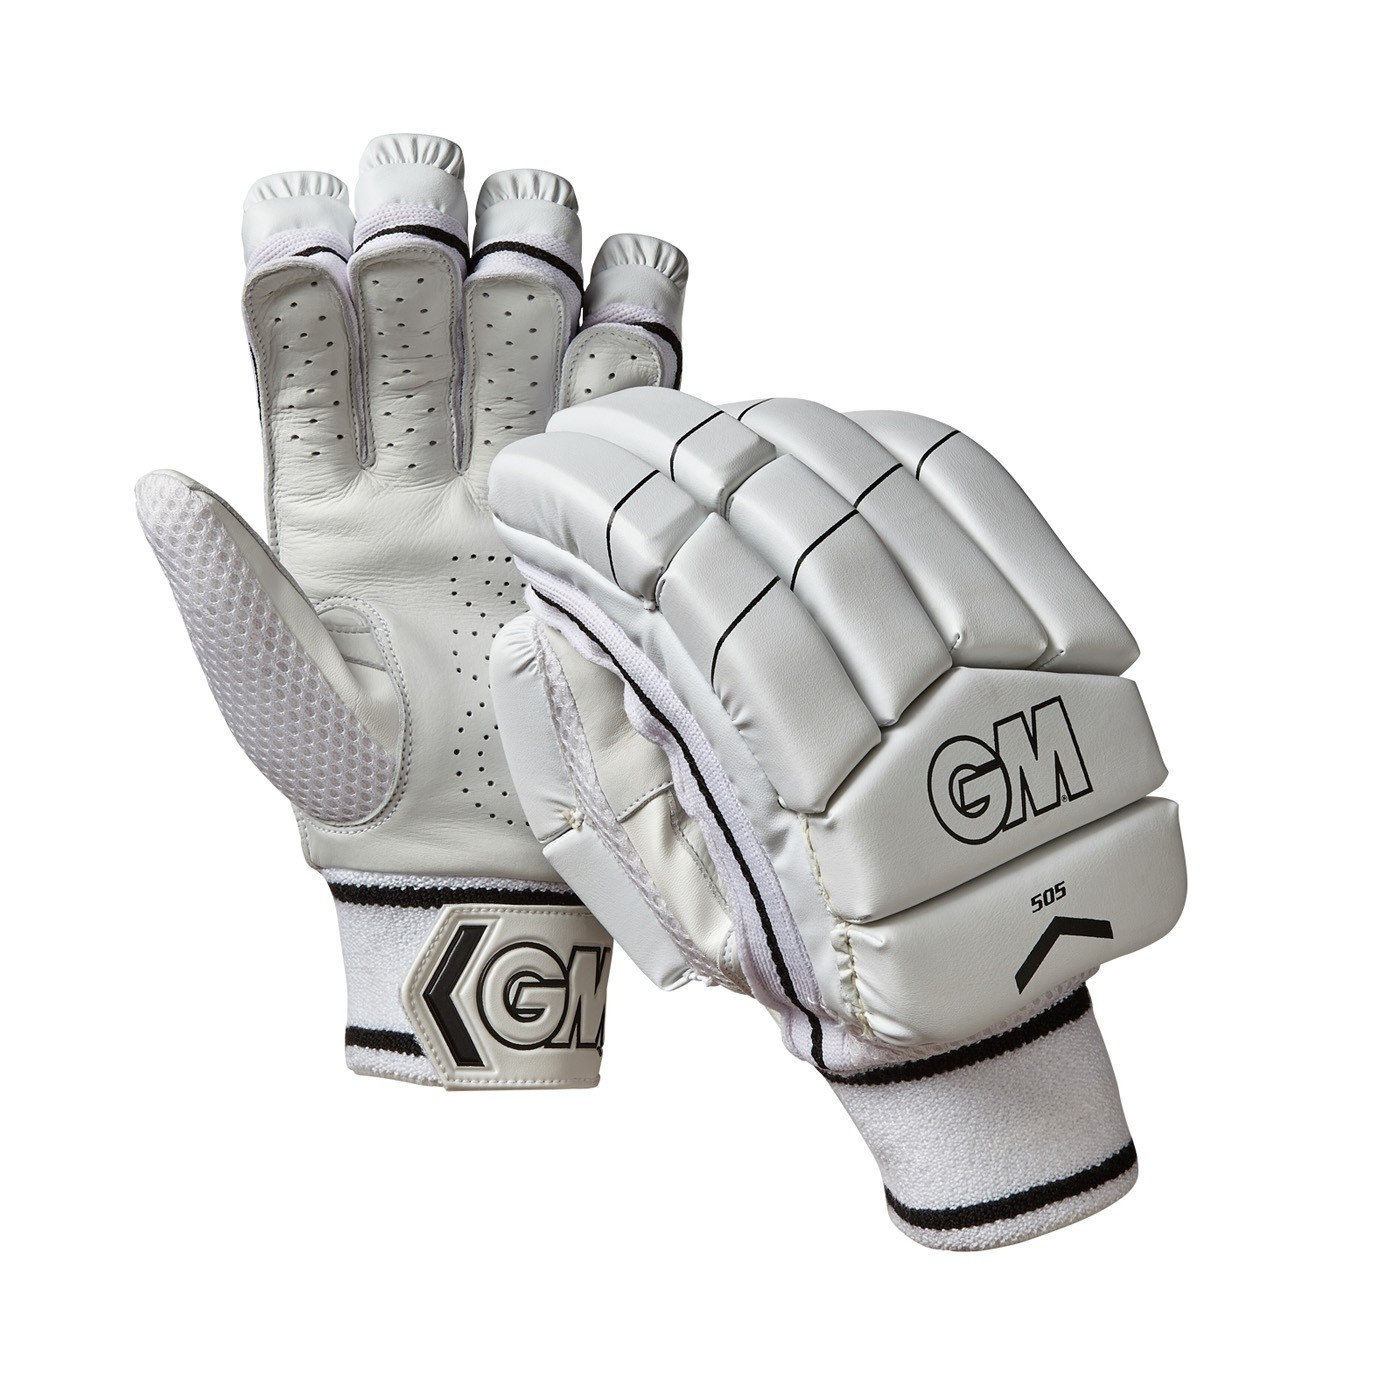 2021 Gunn and Moore 505 Junior Batting Gloves